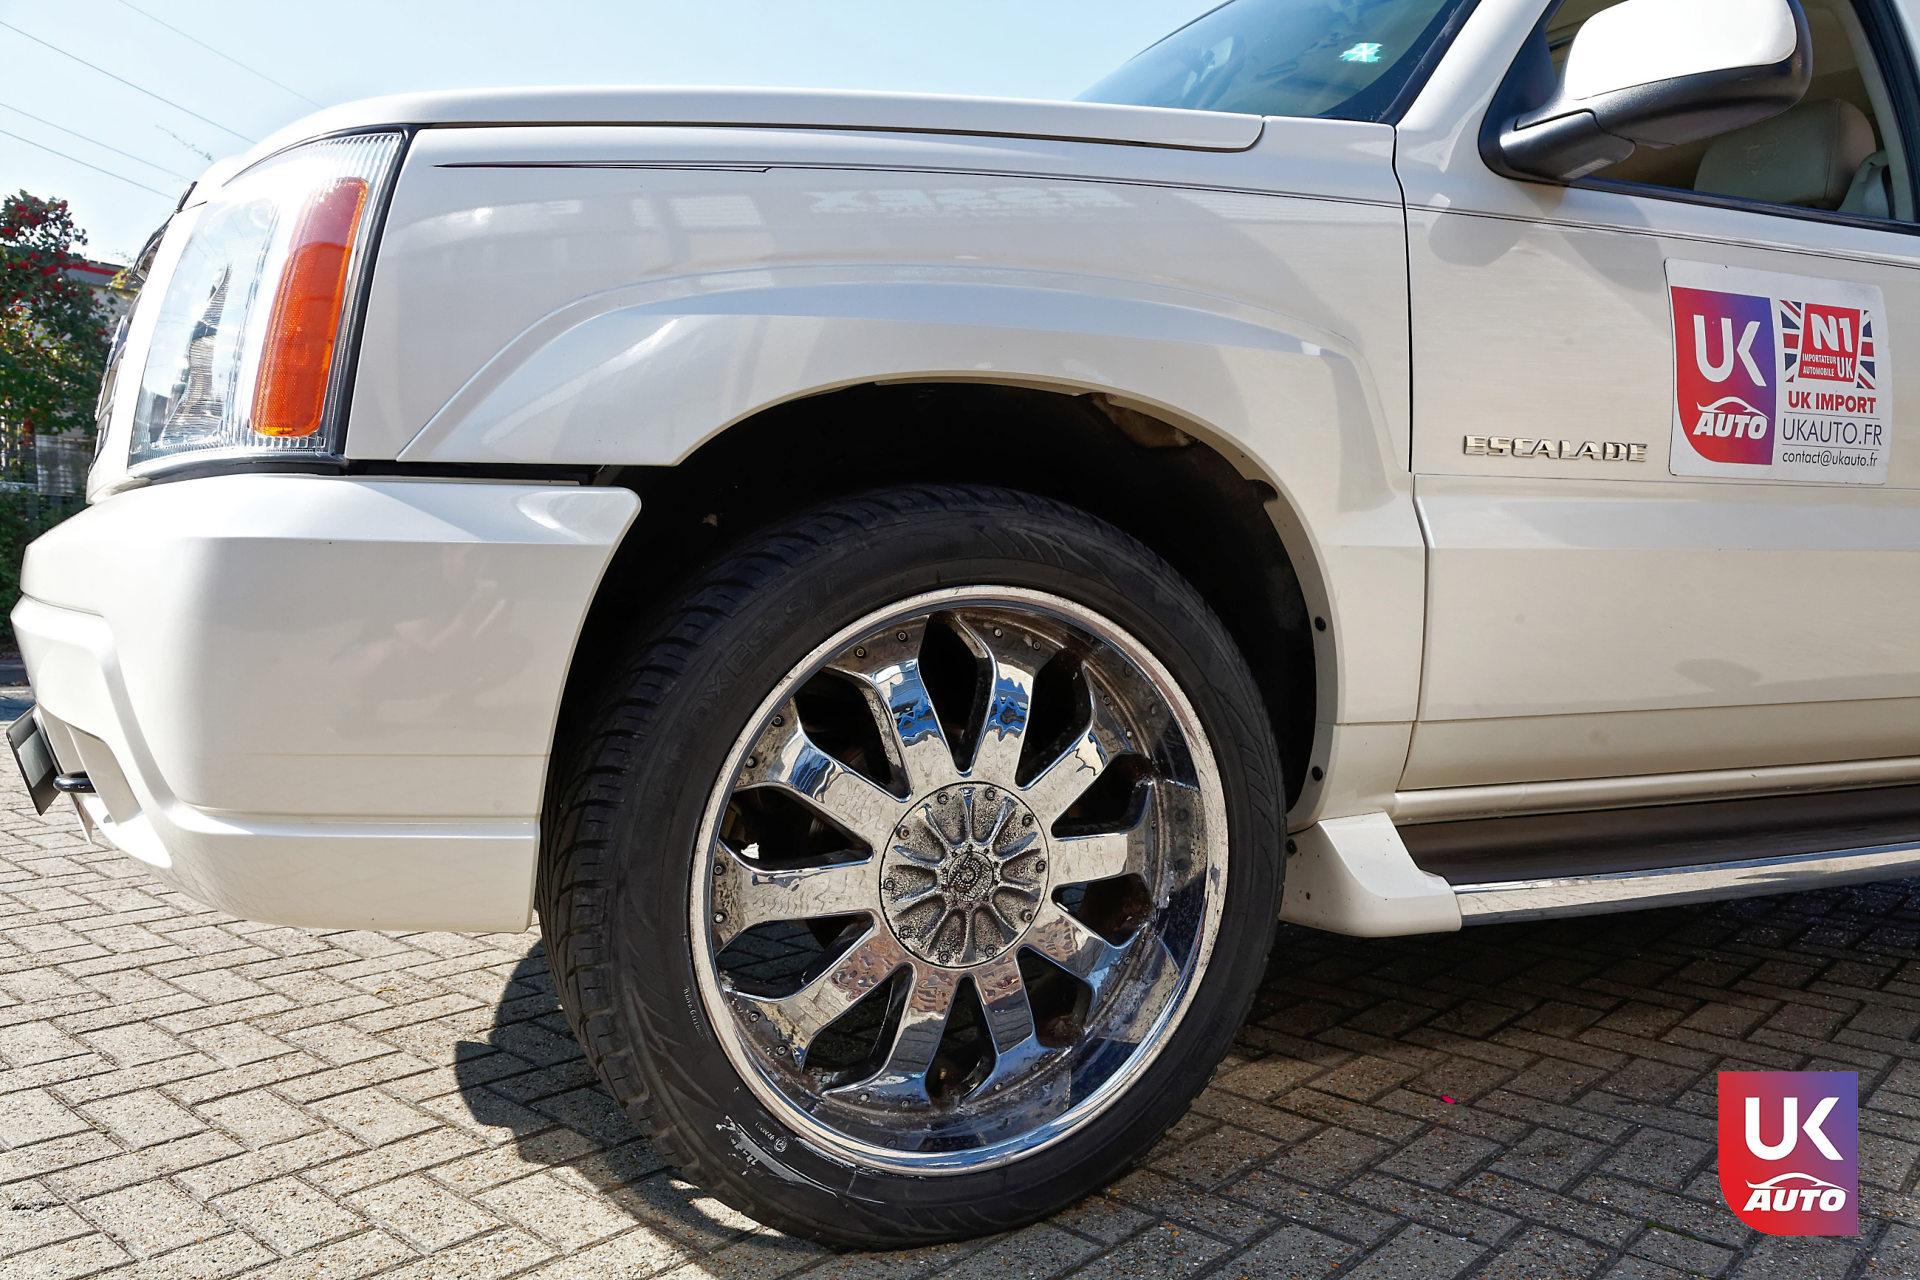 Cadillac Escalade lhd import cadillac angleterre cadillac uk ukauto us import lhd8 DxO - AUTO IMPORT CADILLAC ESCALADE V8 LHD IMPORTATION CADILLAC LHD FELICITATION A BERTRAND